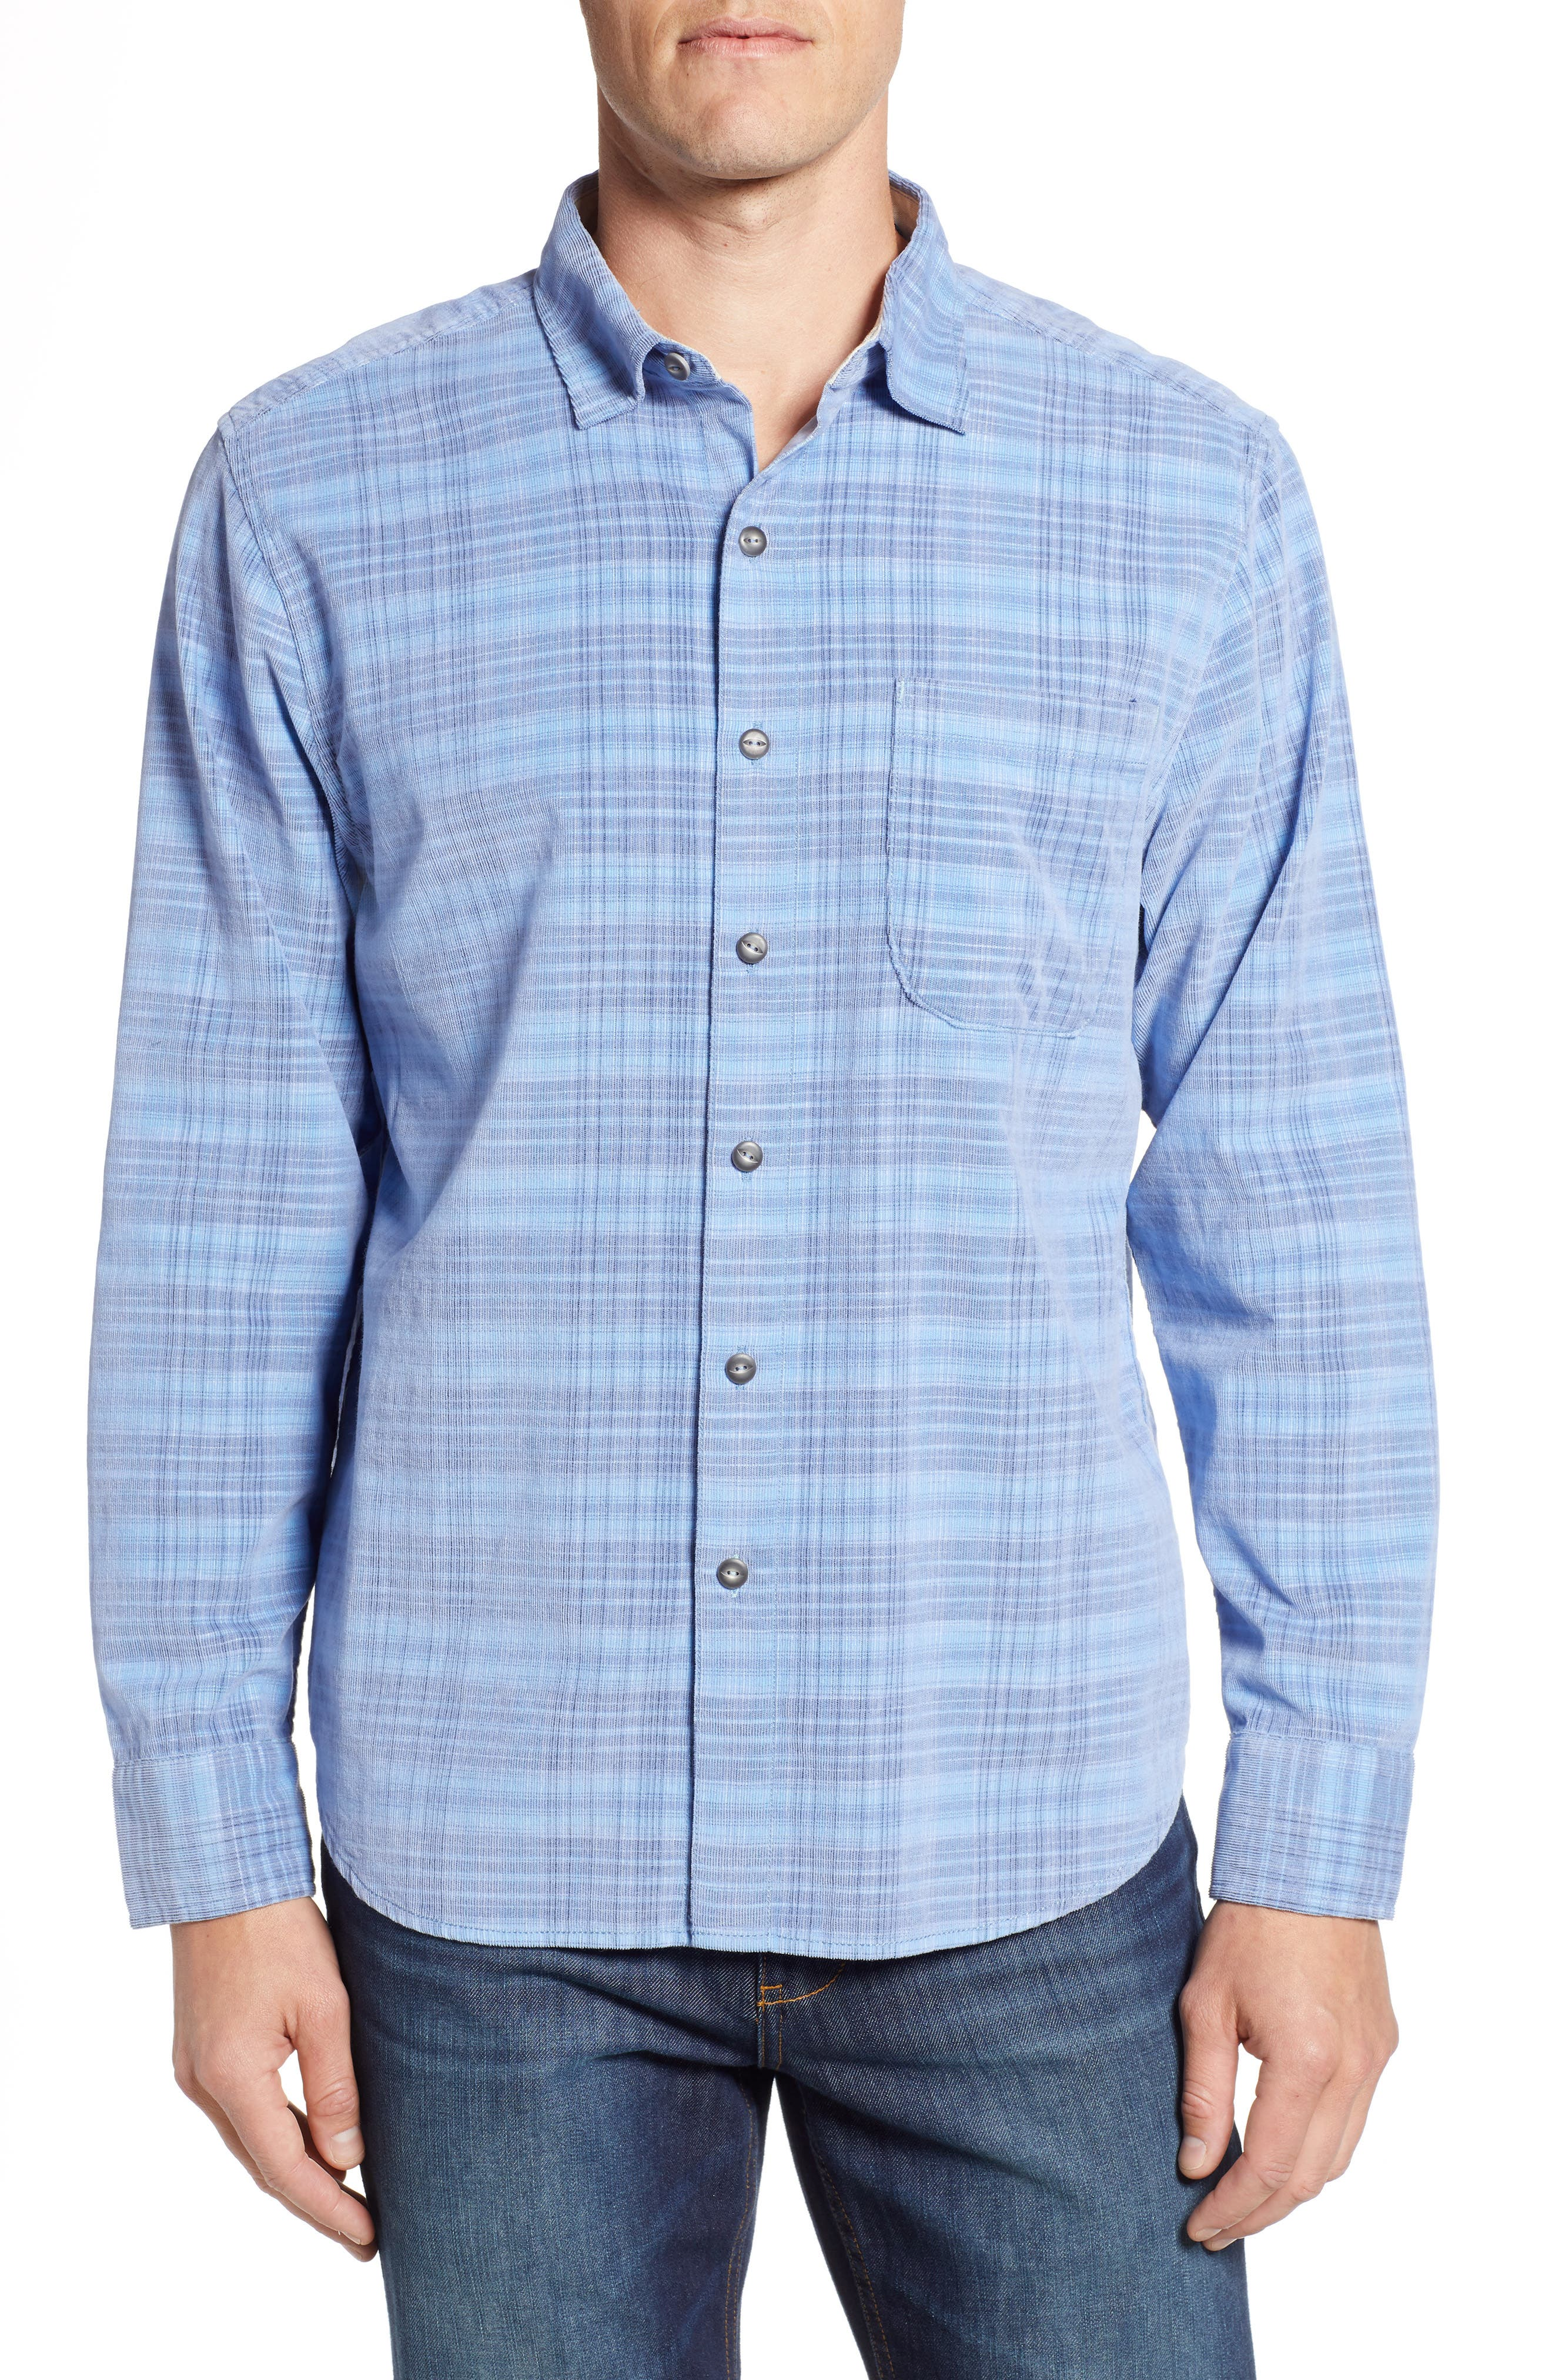 Cruzy Plaid Corduroy Sport Shirt,                         Main,                         color, RIVIERA AZURE